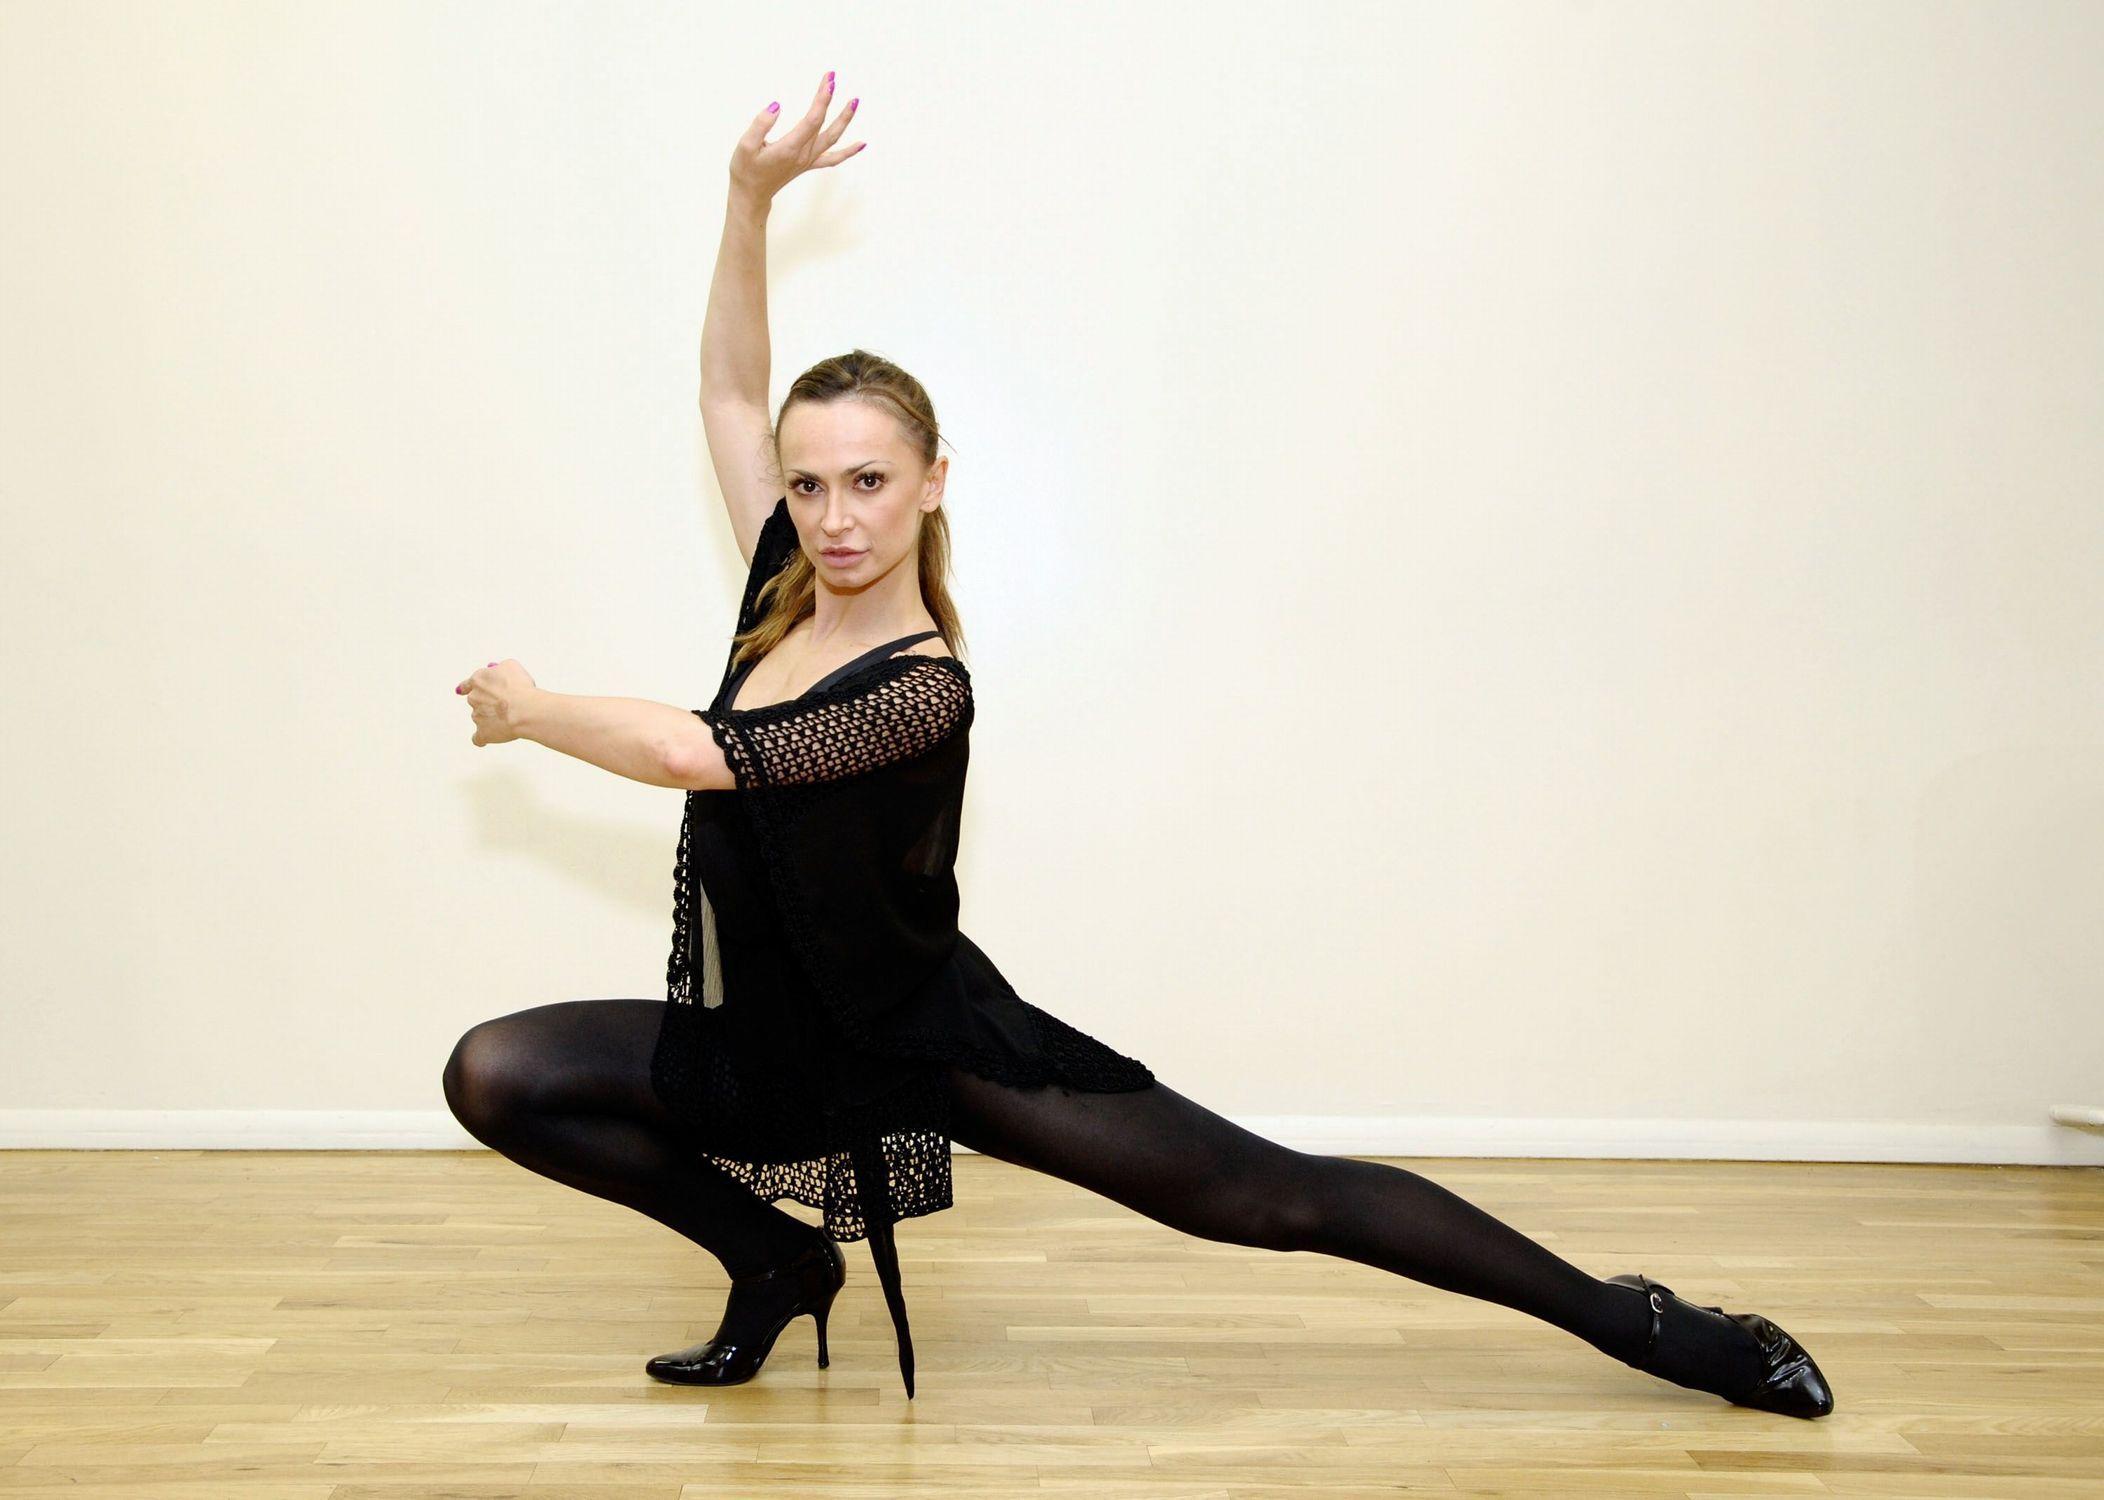 Natalia Kuznetsova Bodybuilder Dating Meme Trash Glory